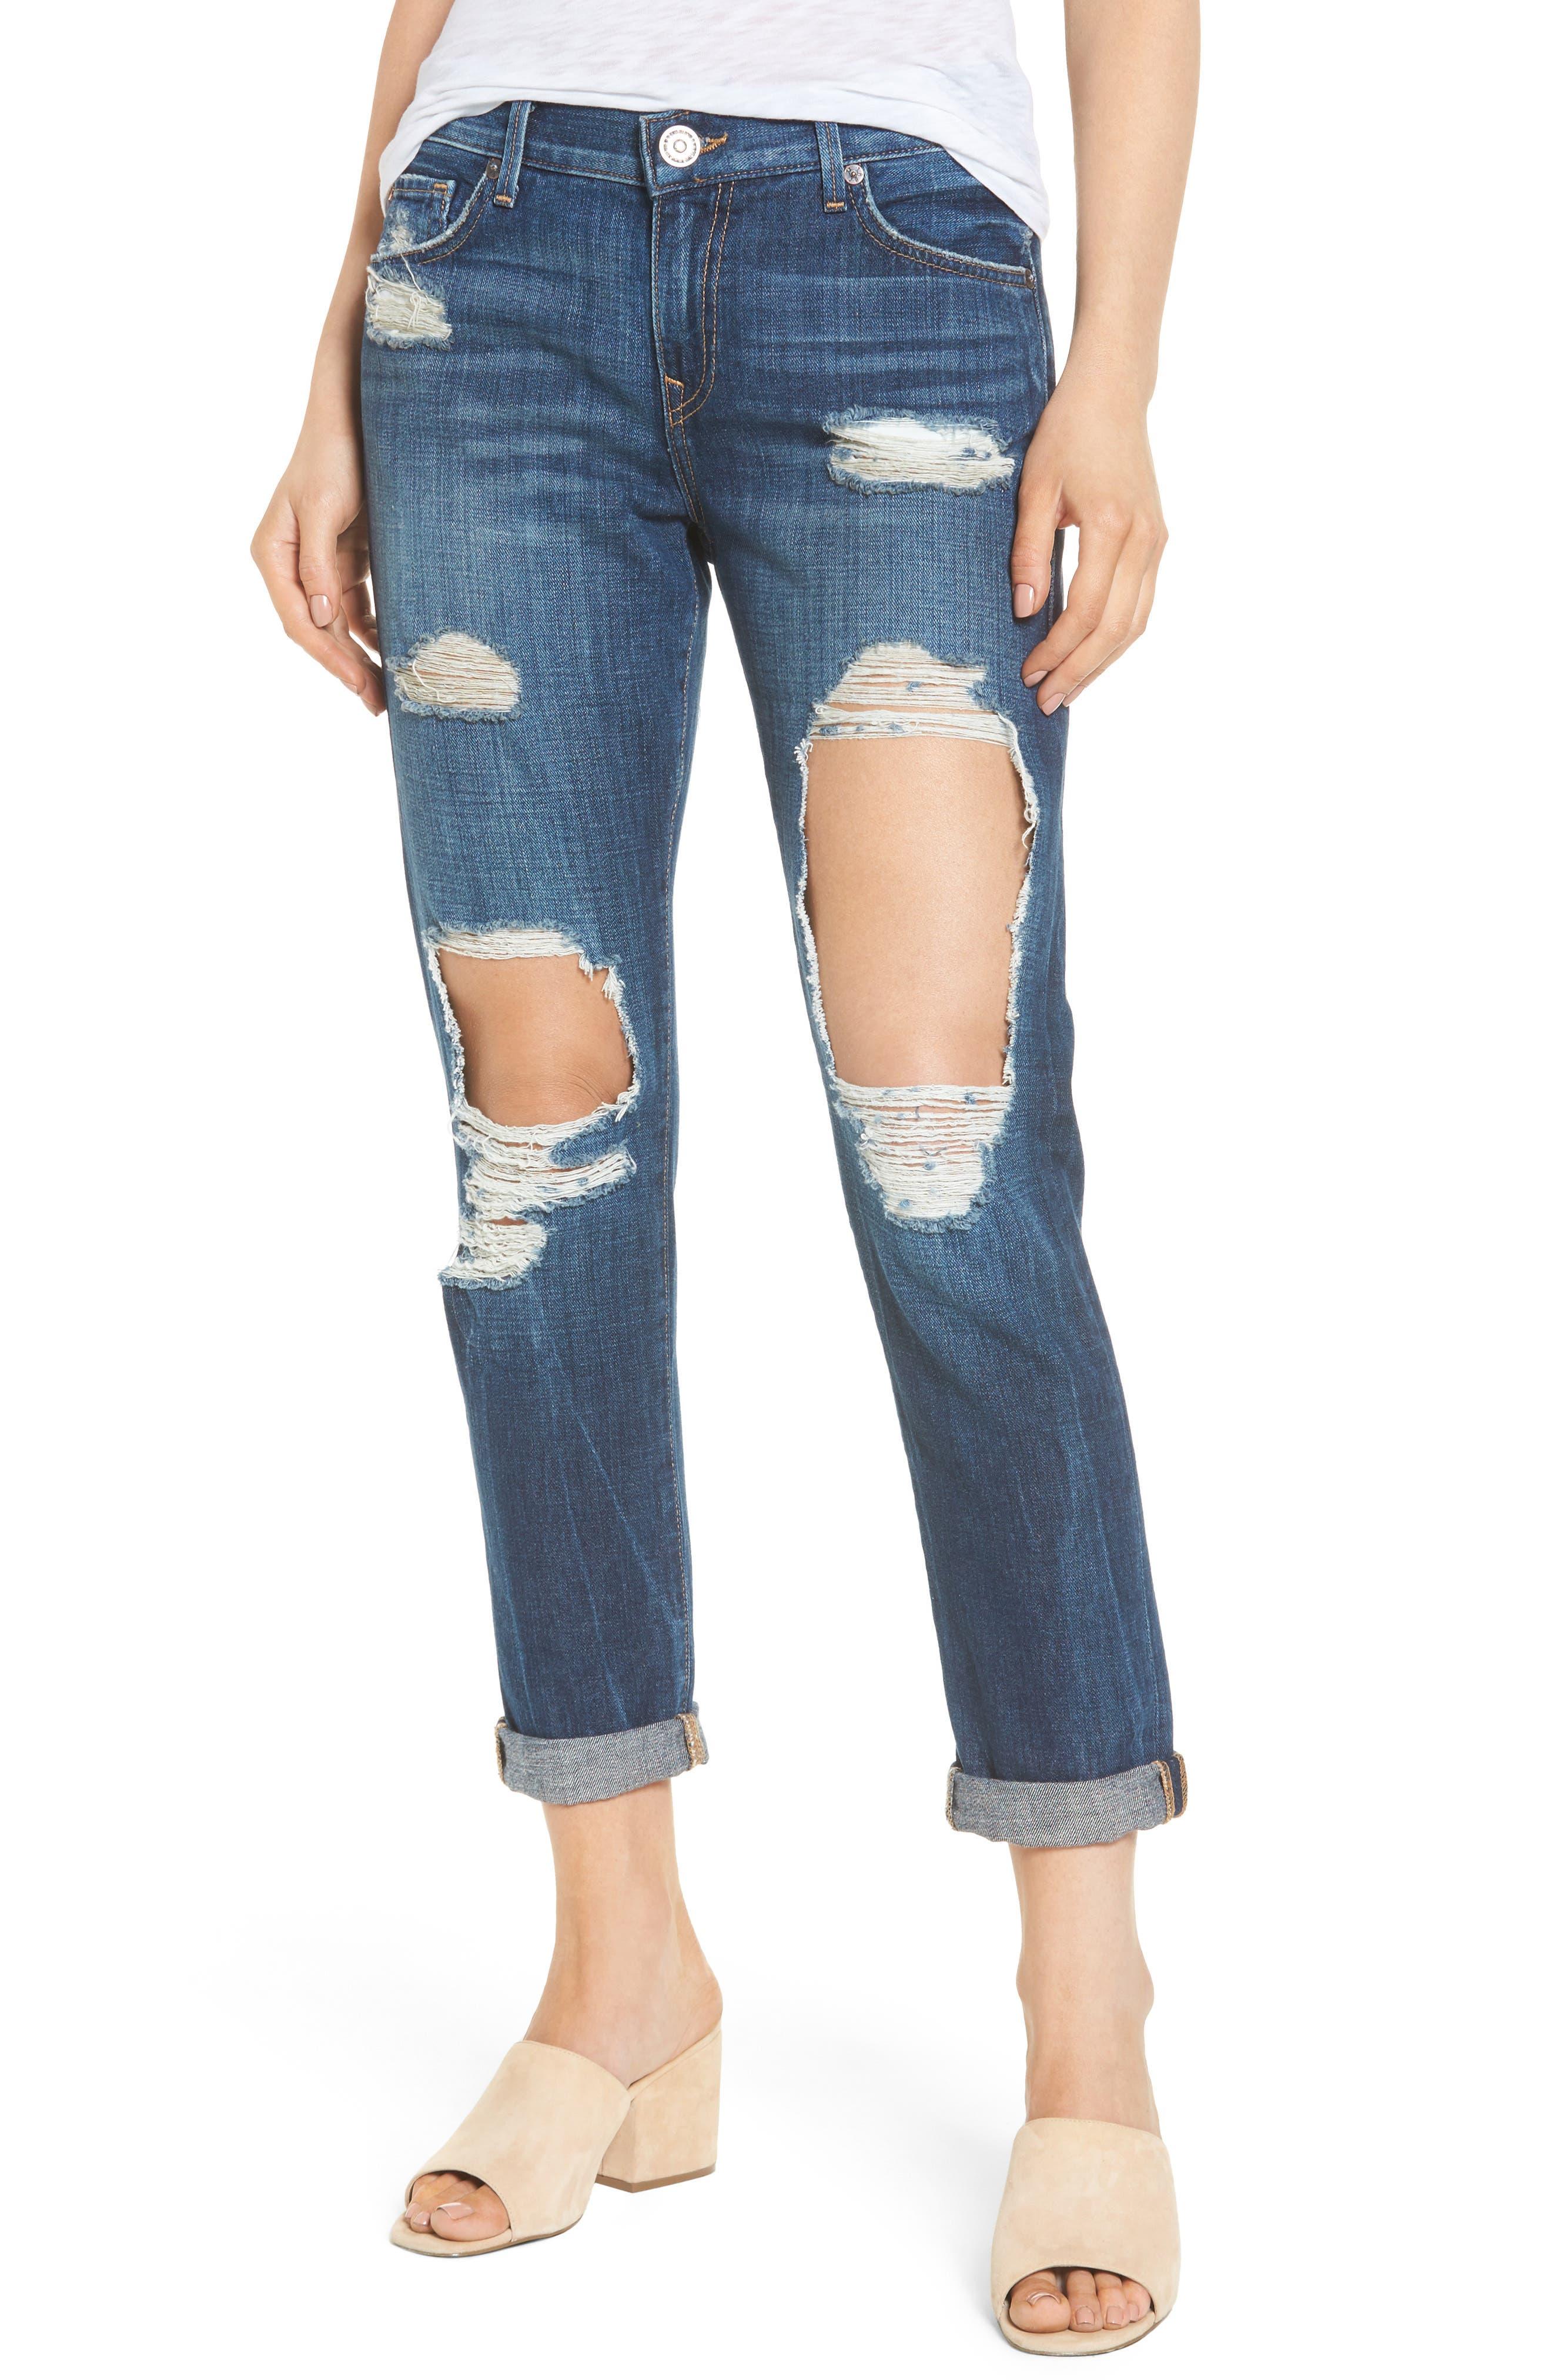 True Religion Brand Jeans Cameron Destroyed Boyfriend Jeans (Celestial Sky)